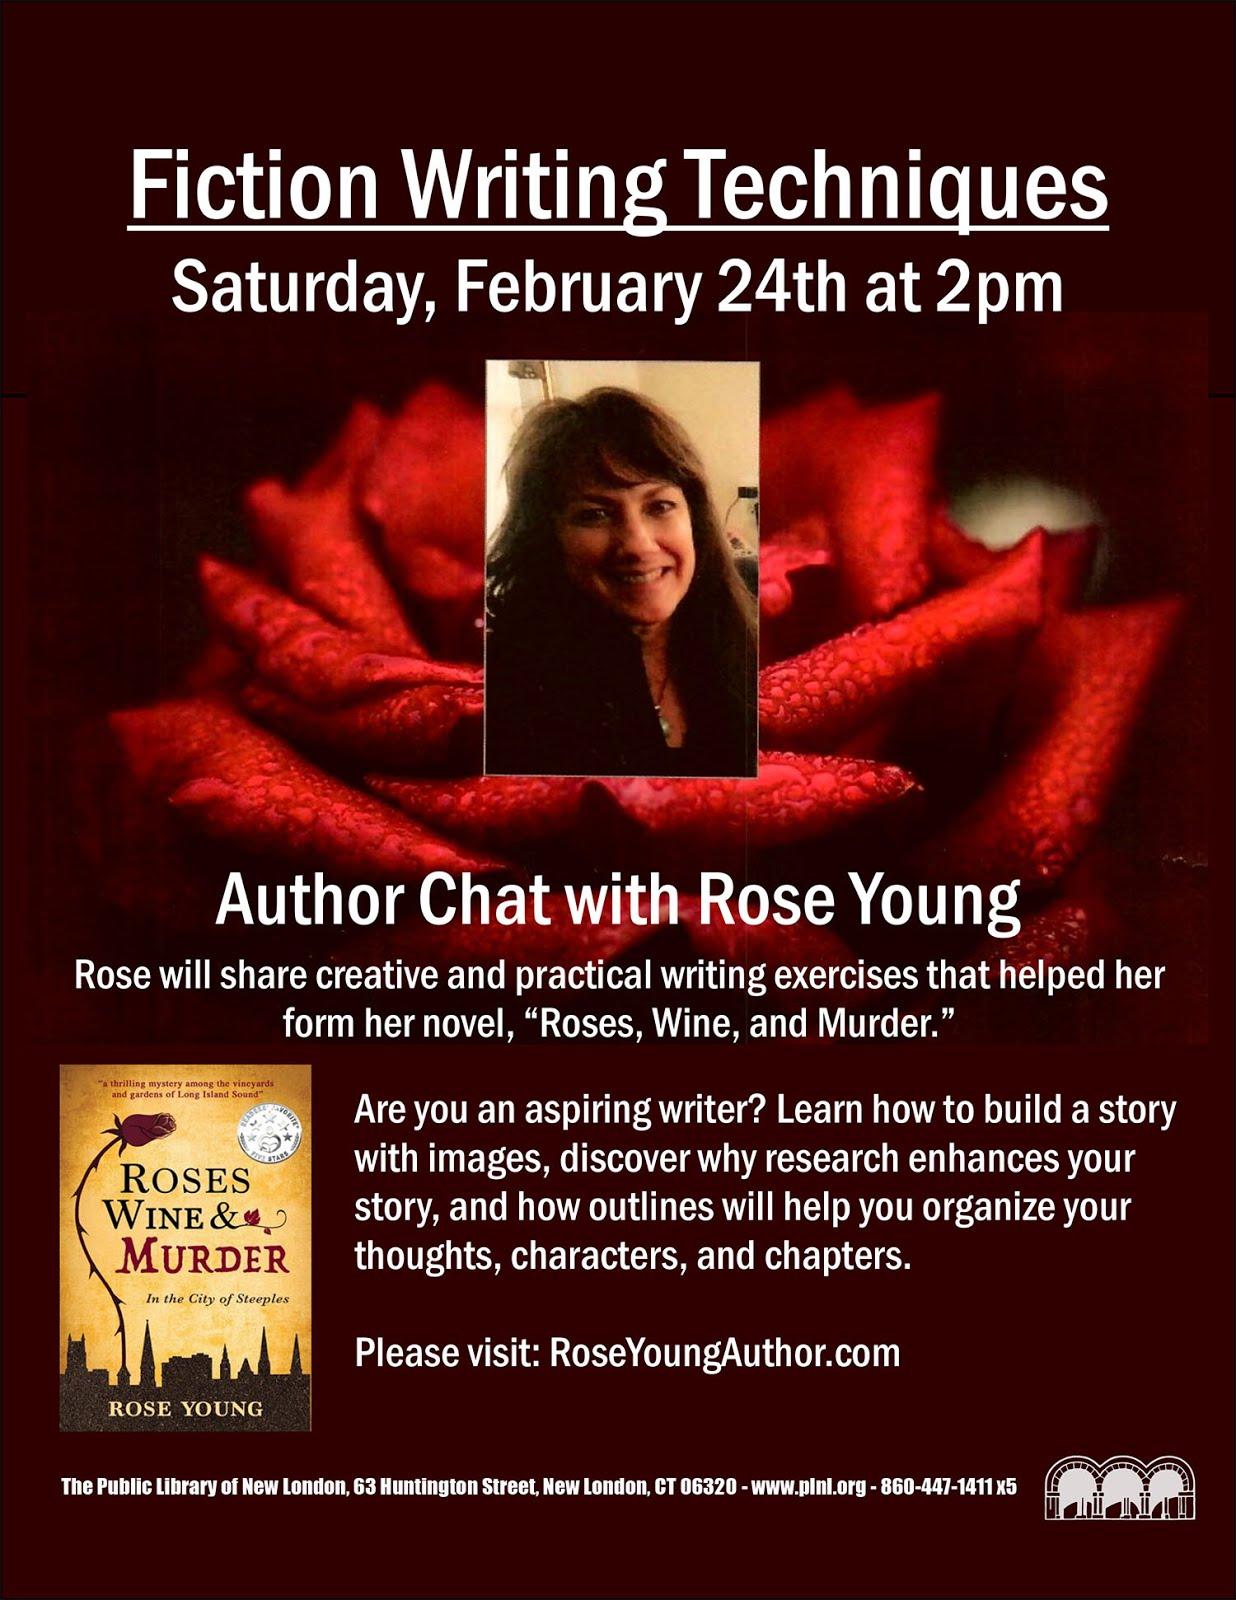 Fiction Writing Techniques - Author Chat